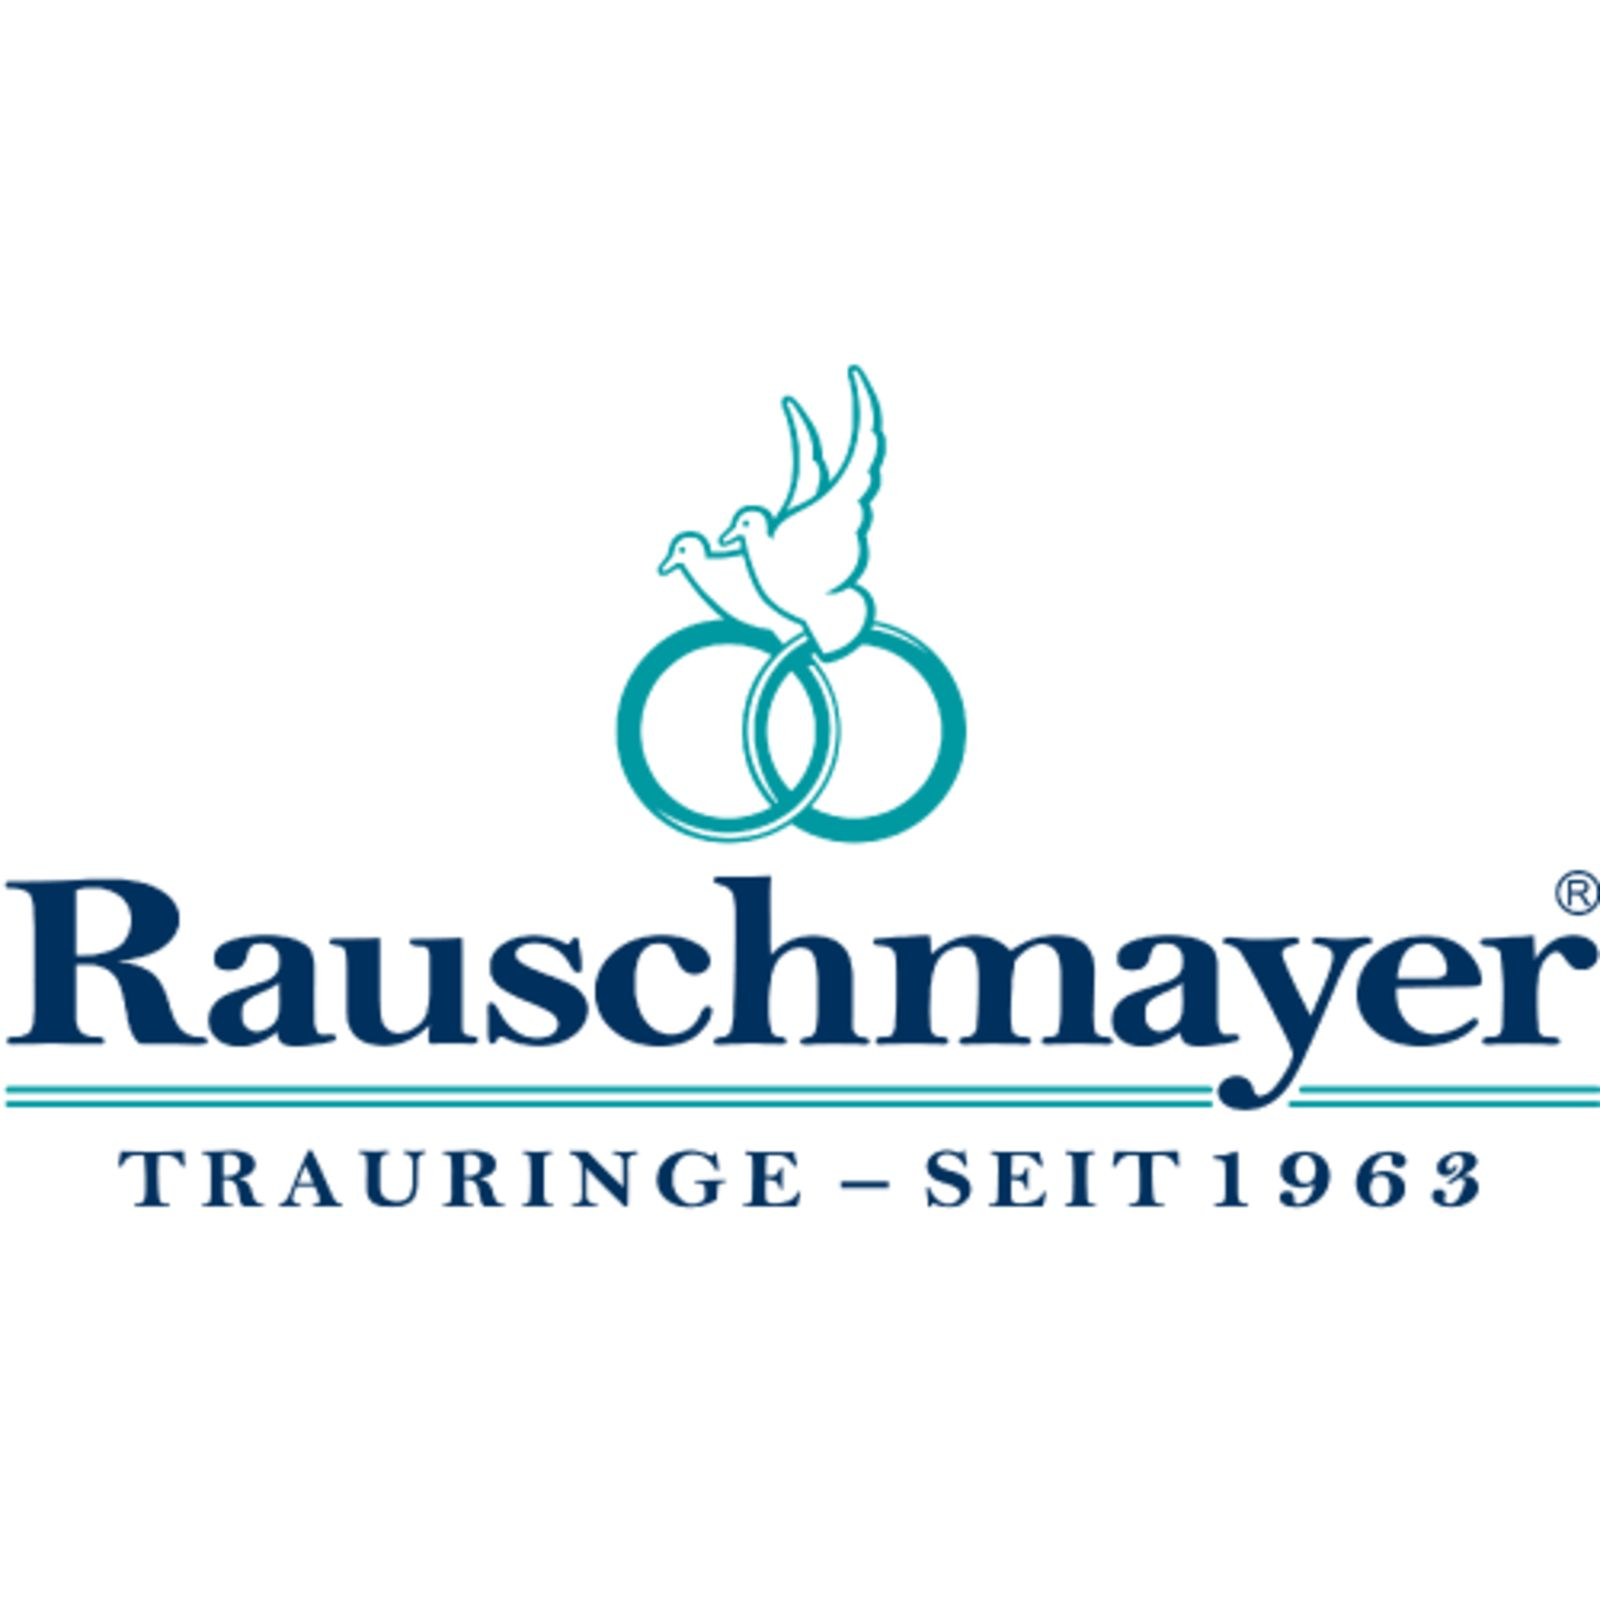 Rauschmayer®